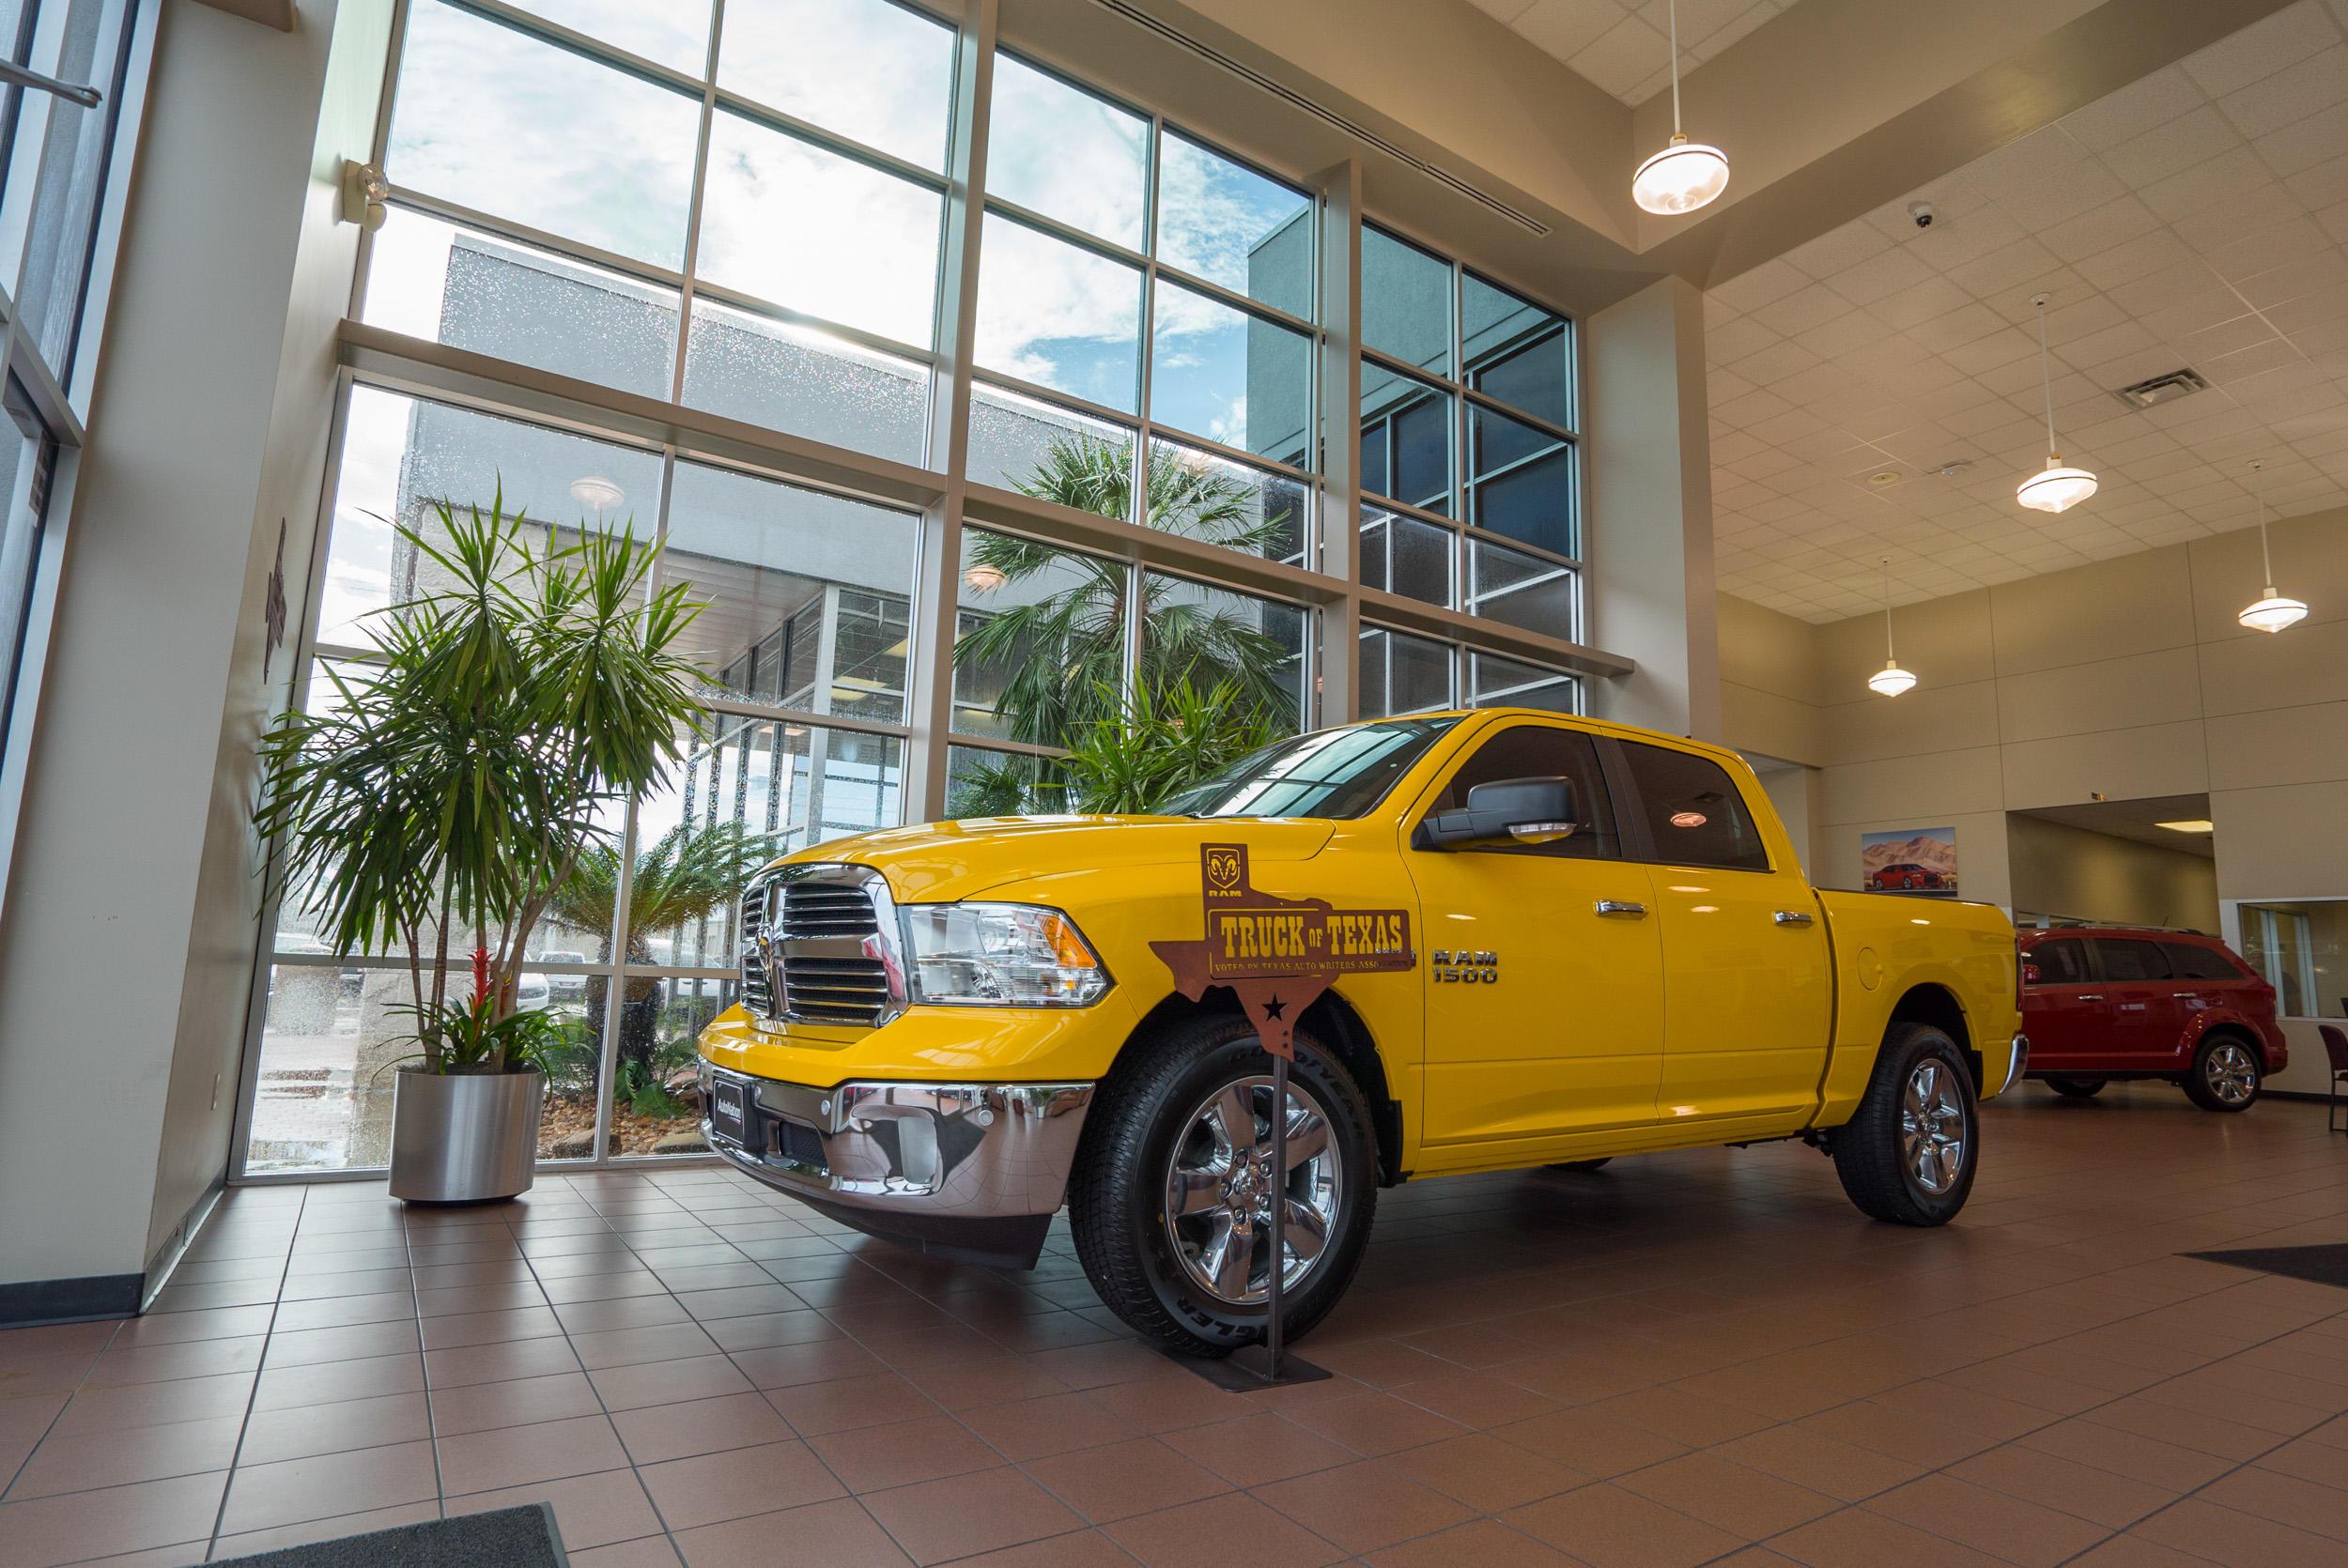 Allen Samuels Dodge Chrysler Jeep Ram Houston 1515 S Loop W Houston